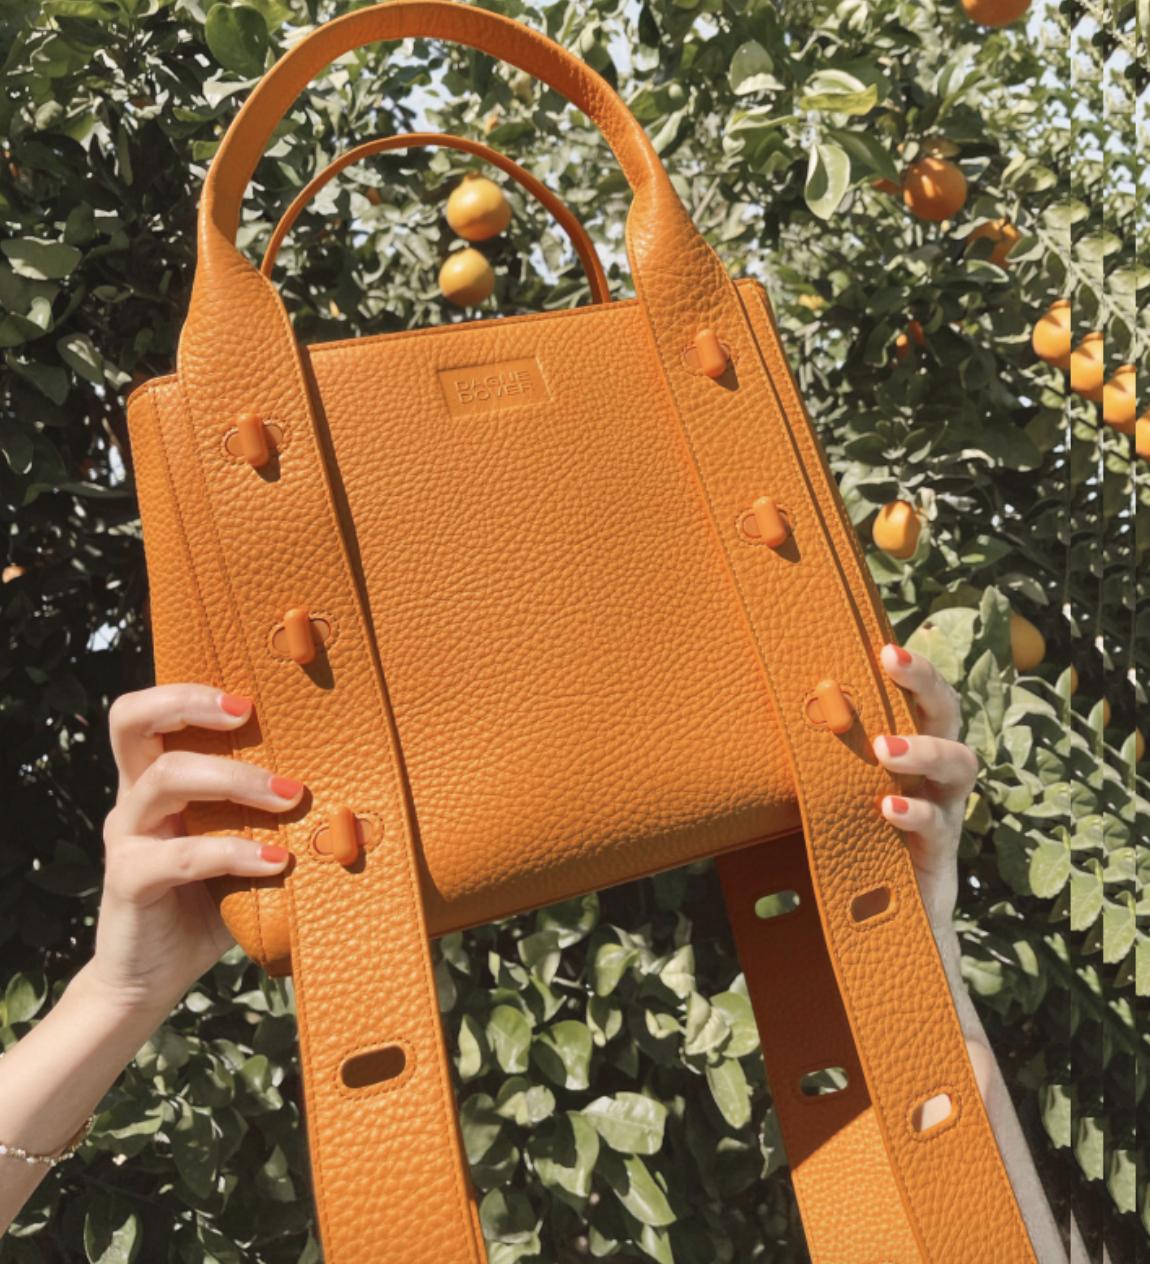 model holding the orange bag